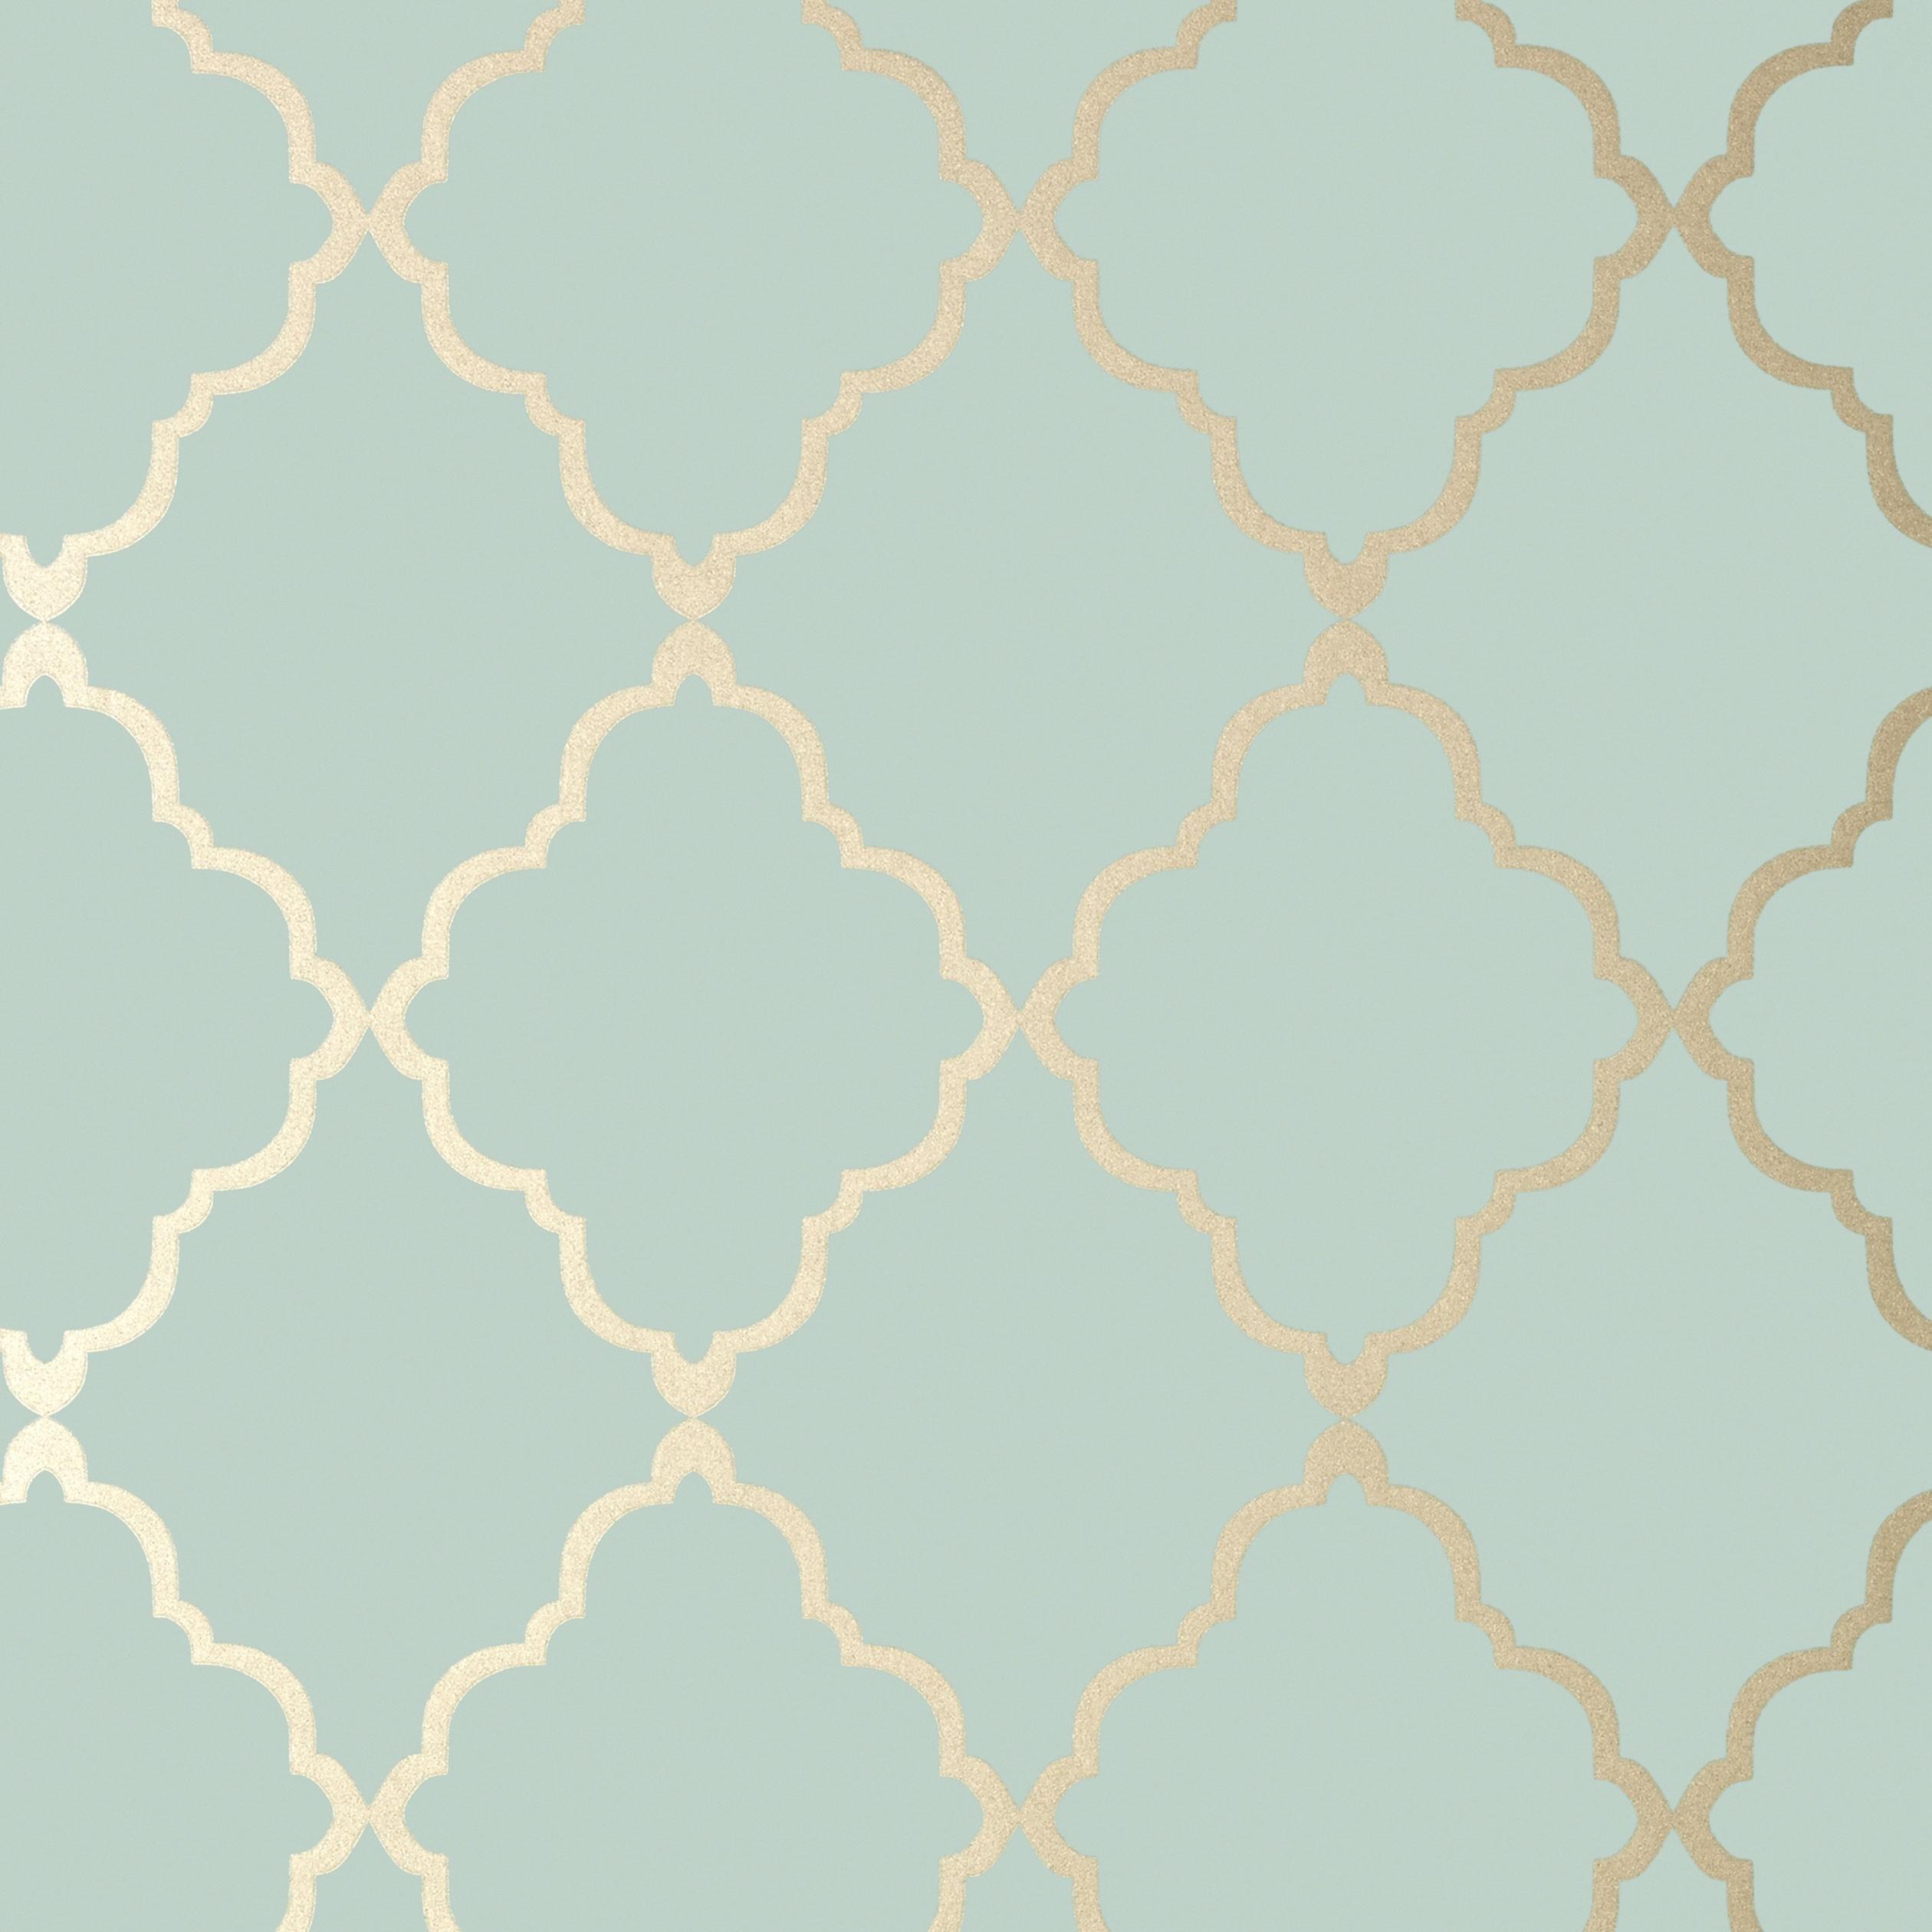 Duck Egg Blue Wallpaper Great Duck Egg Blue Wallpaper Designs - Duck egg blue bedroom wallpaper